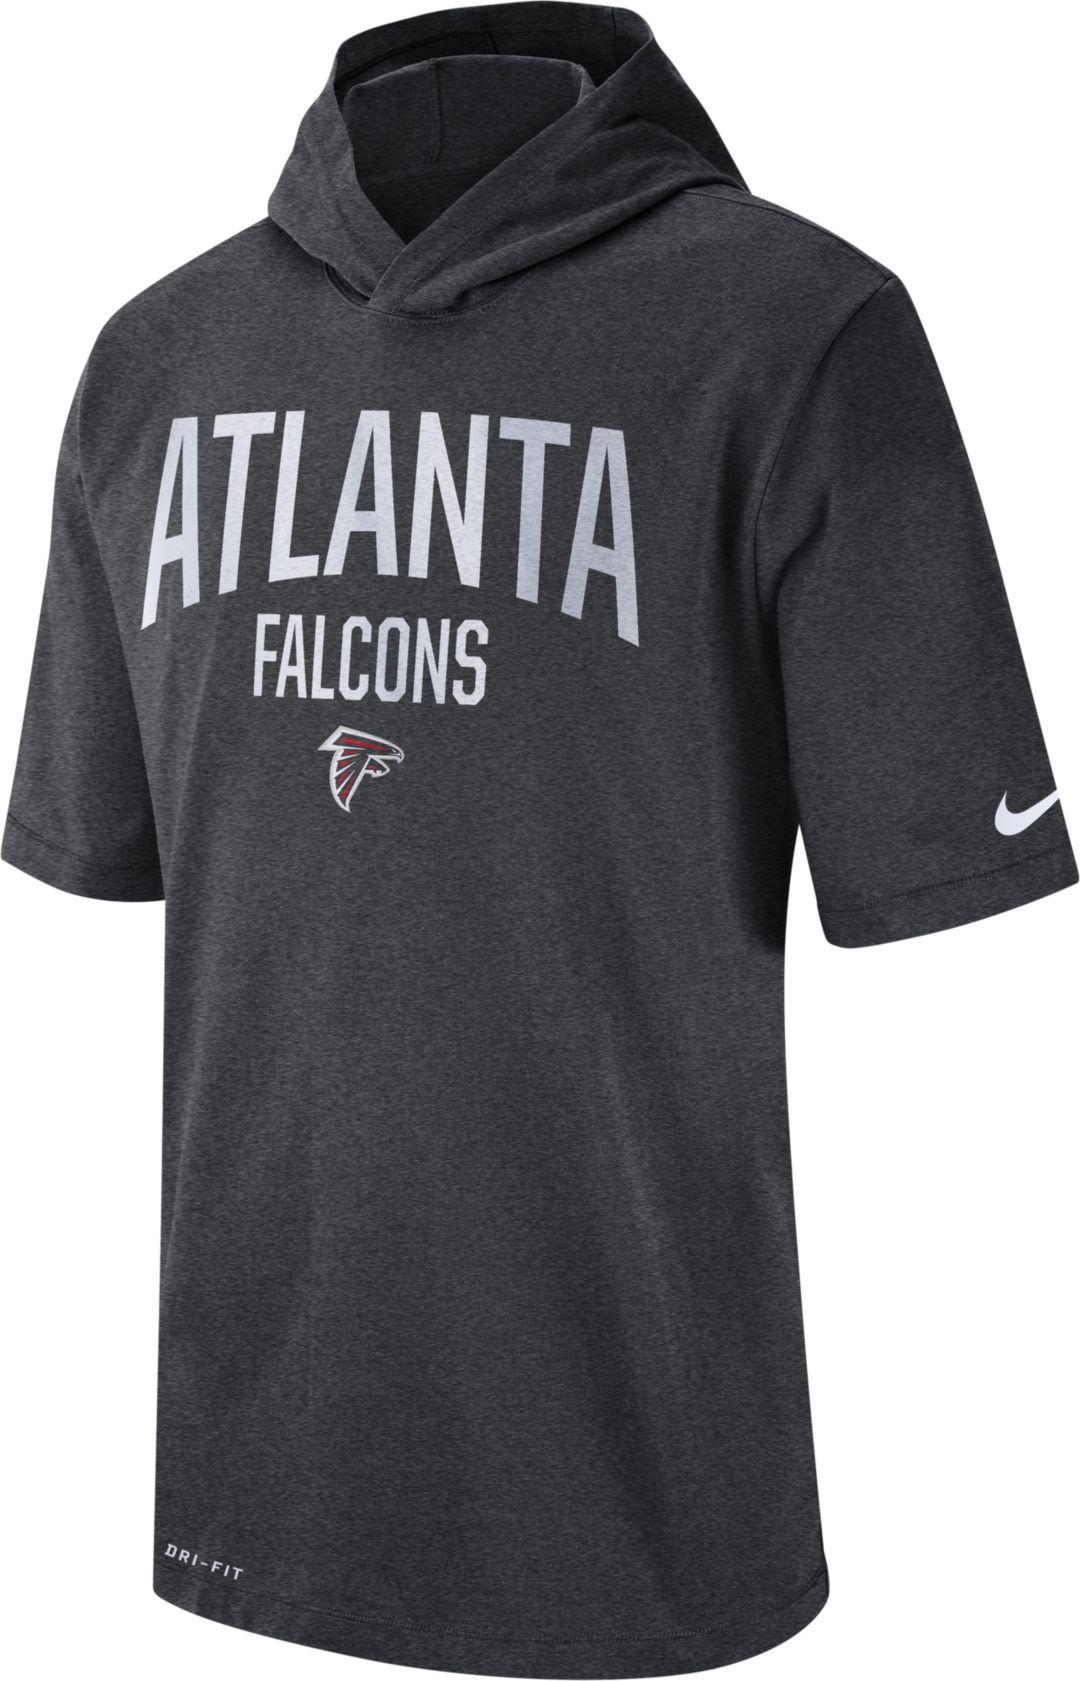 reputable site 79f15 b75d1 Nike Men's Atlanta Falcons Sideline Charcoal Short-Sleeve Hoodie T-Shirt